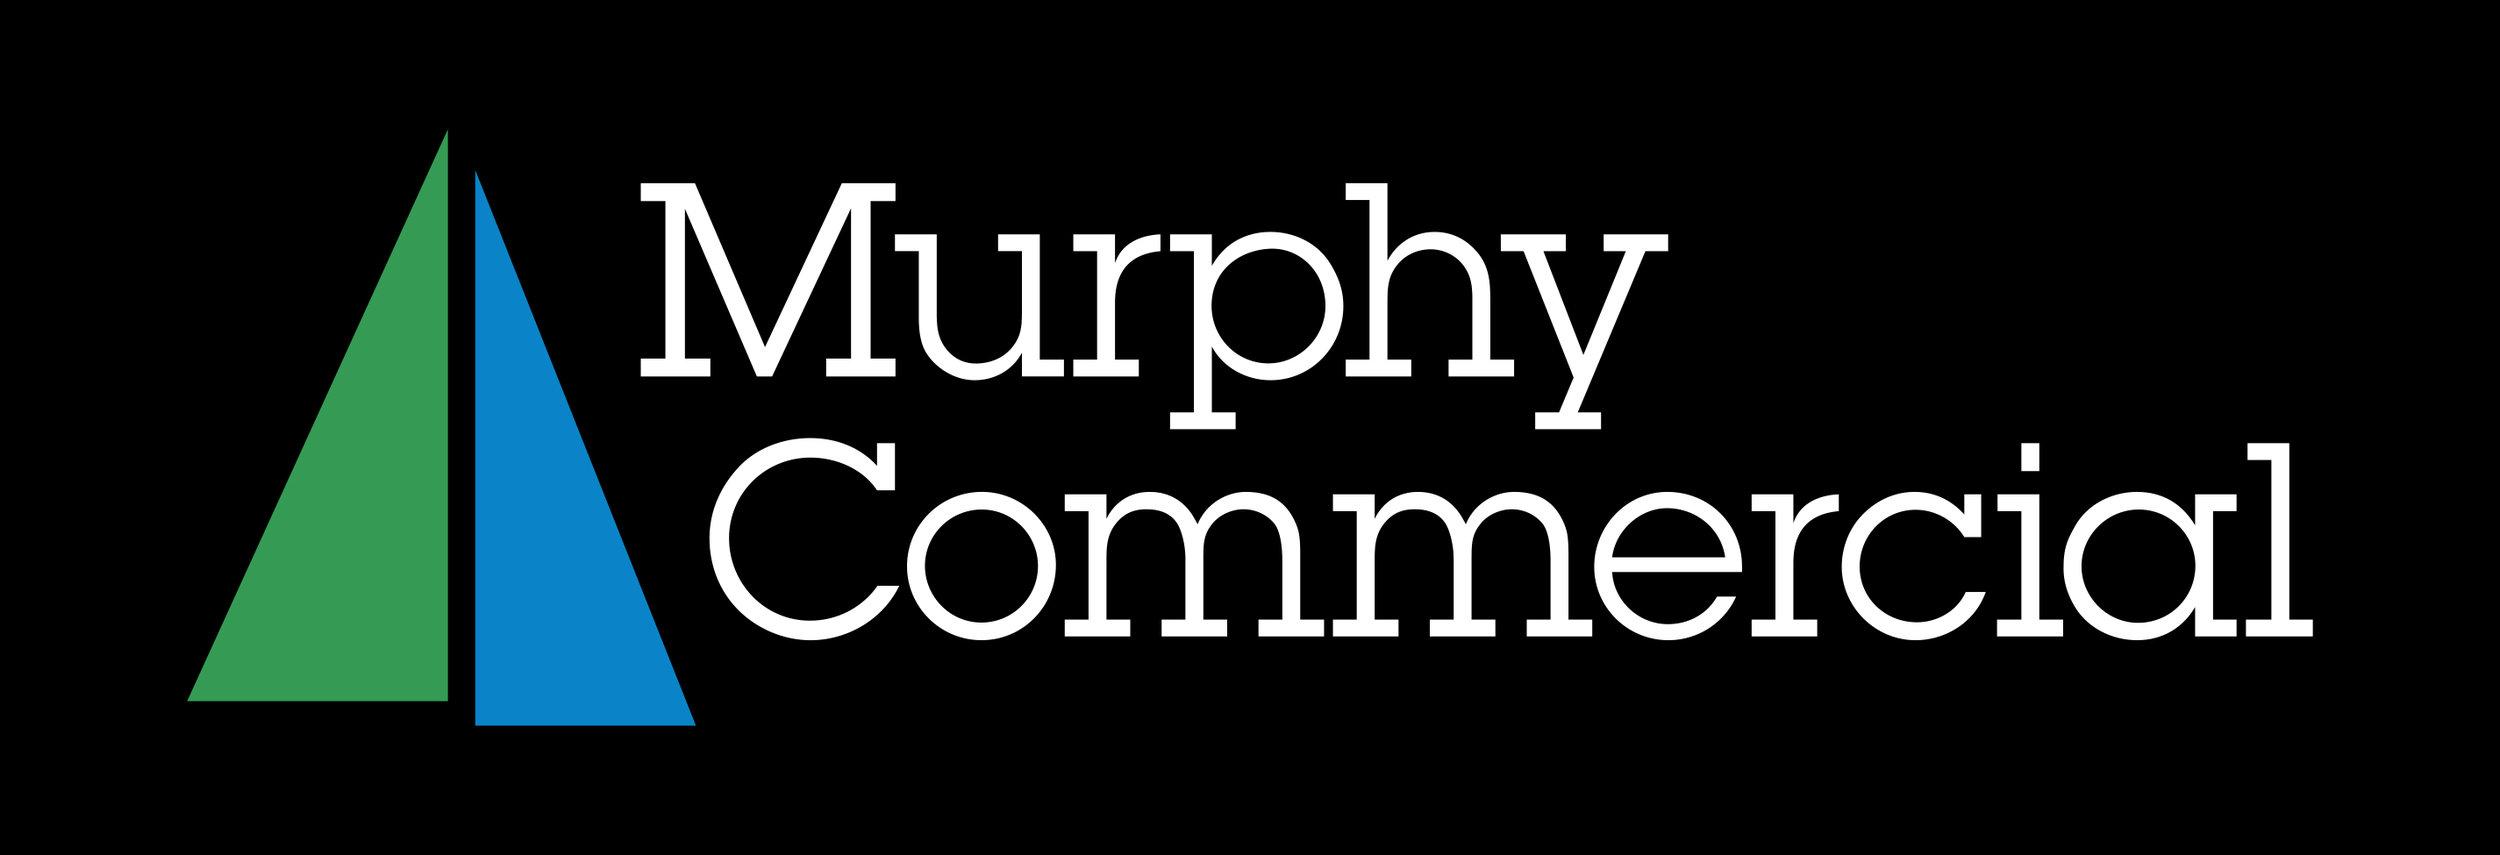 murphy_logo_onBlack.jpg